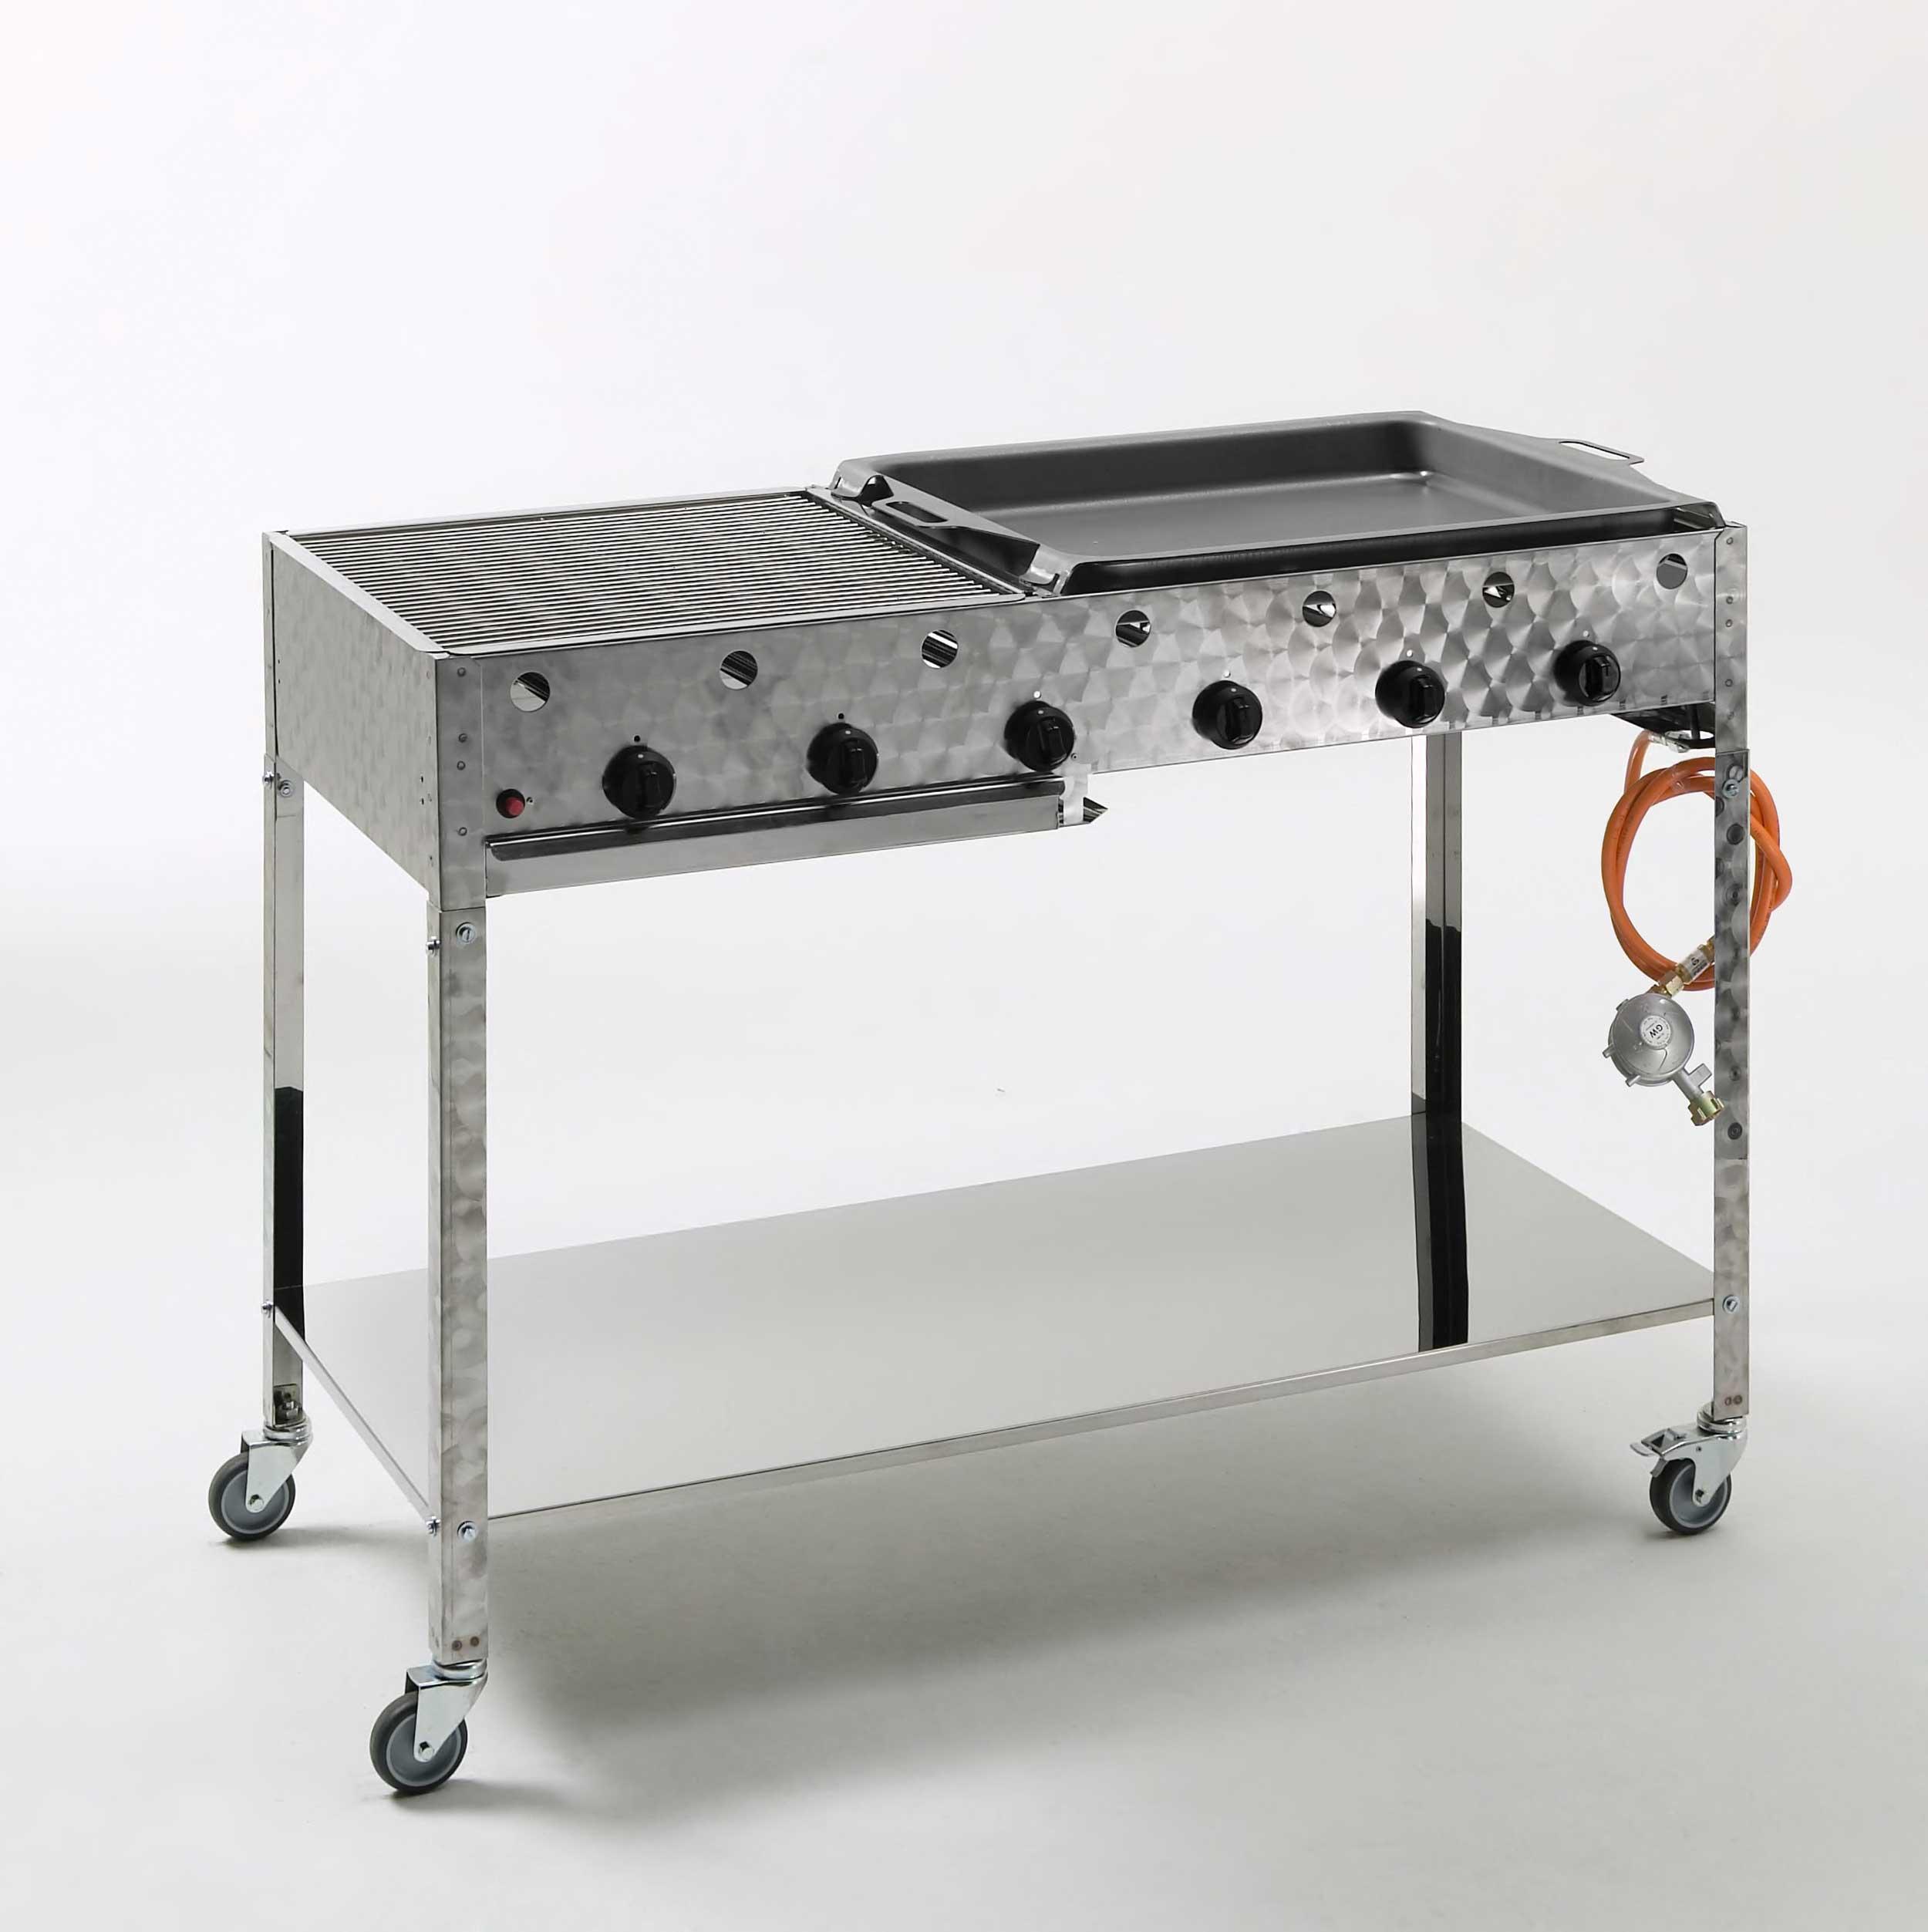 landmann gasbr ter und grillrost 6 flammig 6x4kw 00446m bei. Black Bedroom Furniture Sets. Home Design Ideas